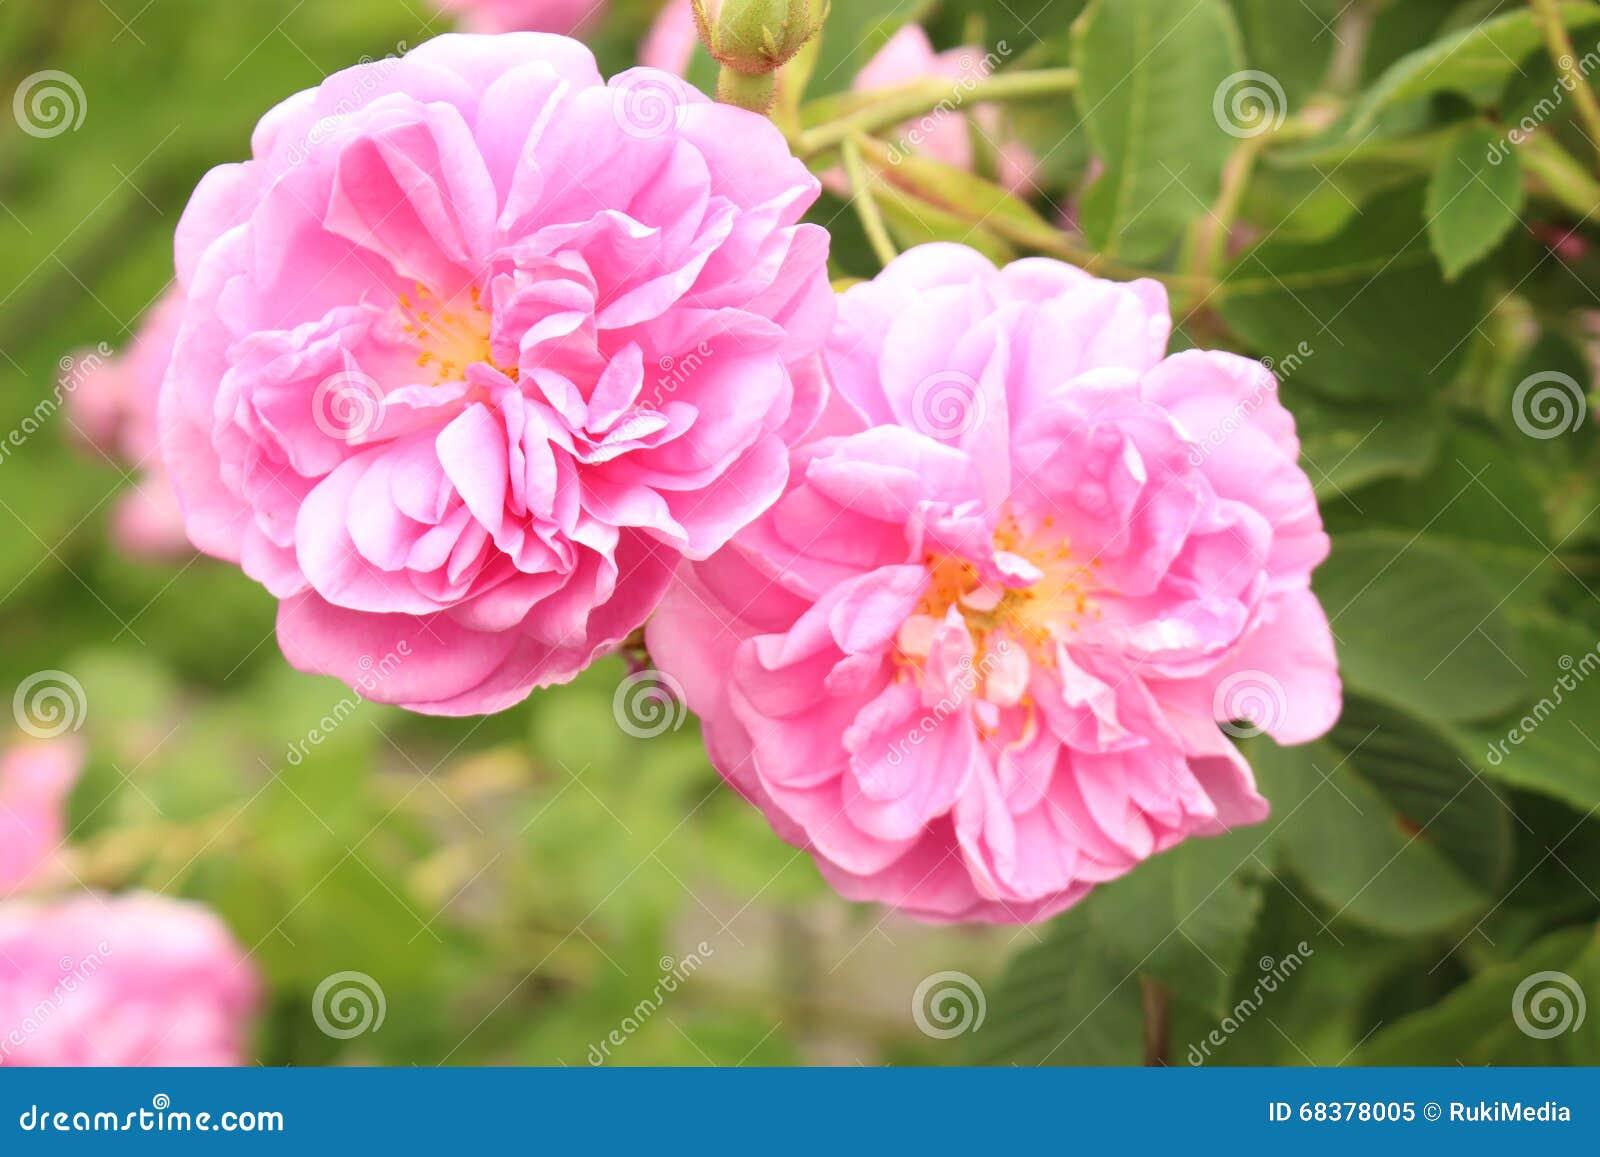 Rosa damascena - Rosa x Damascena